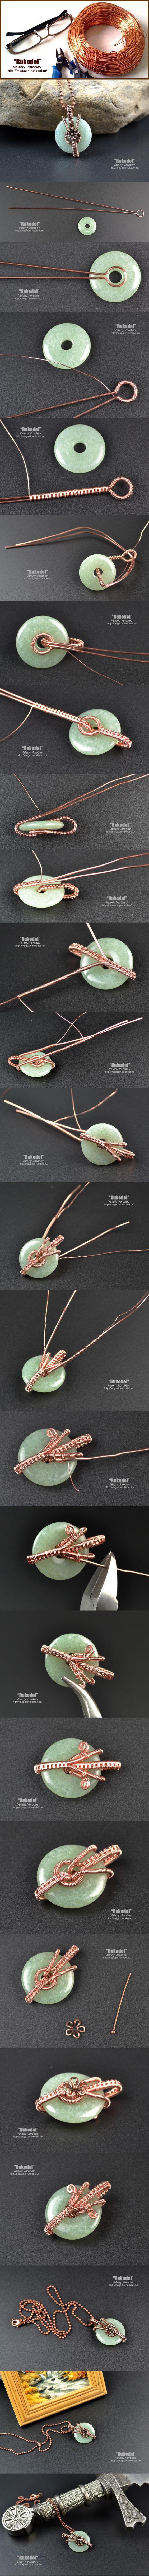 Wire Wrap Pendant Bonsai Wiring Techniques